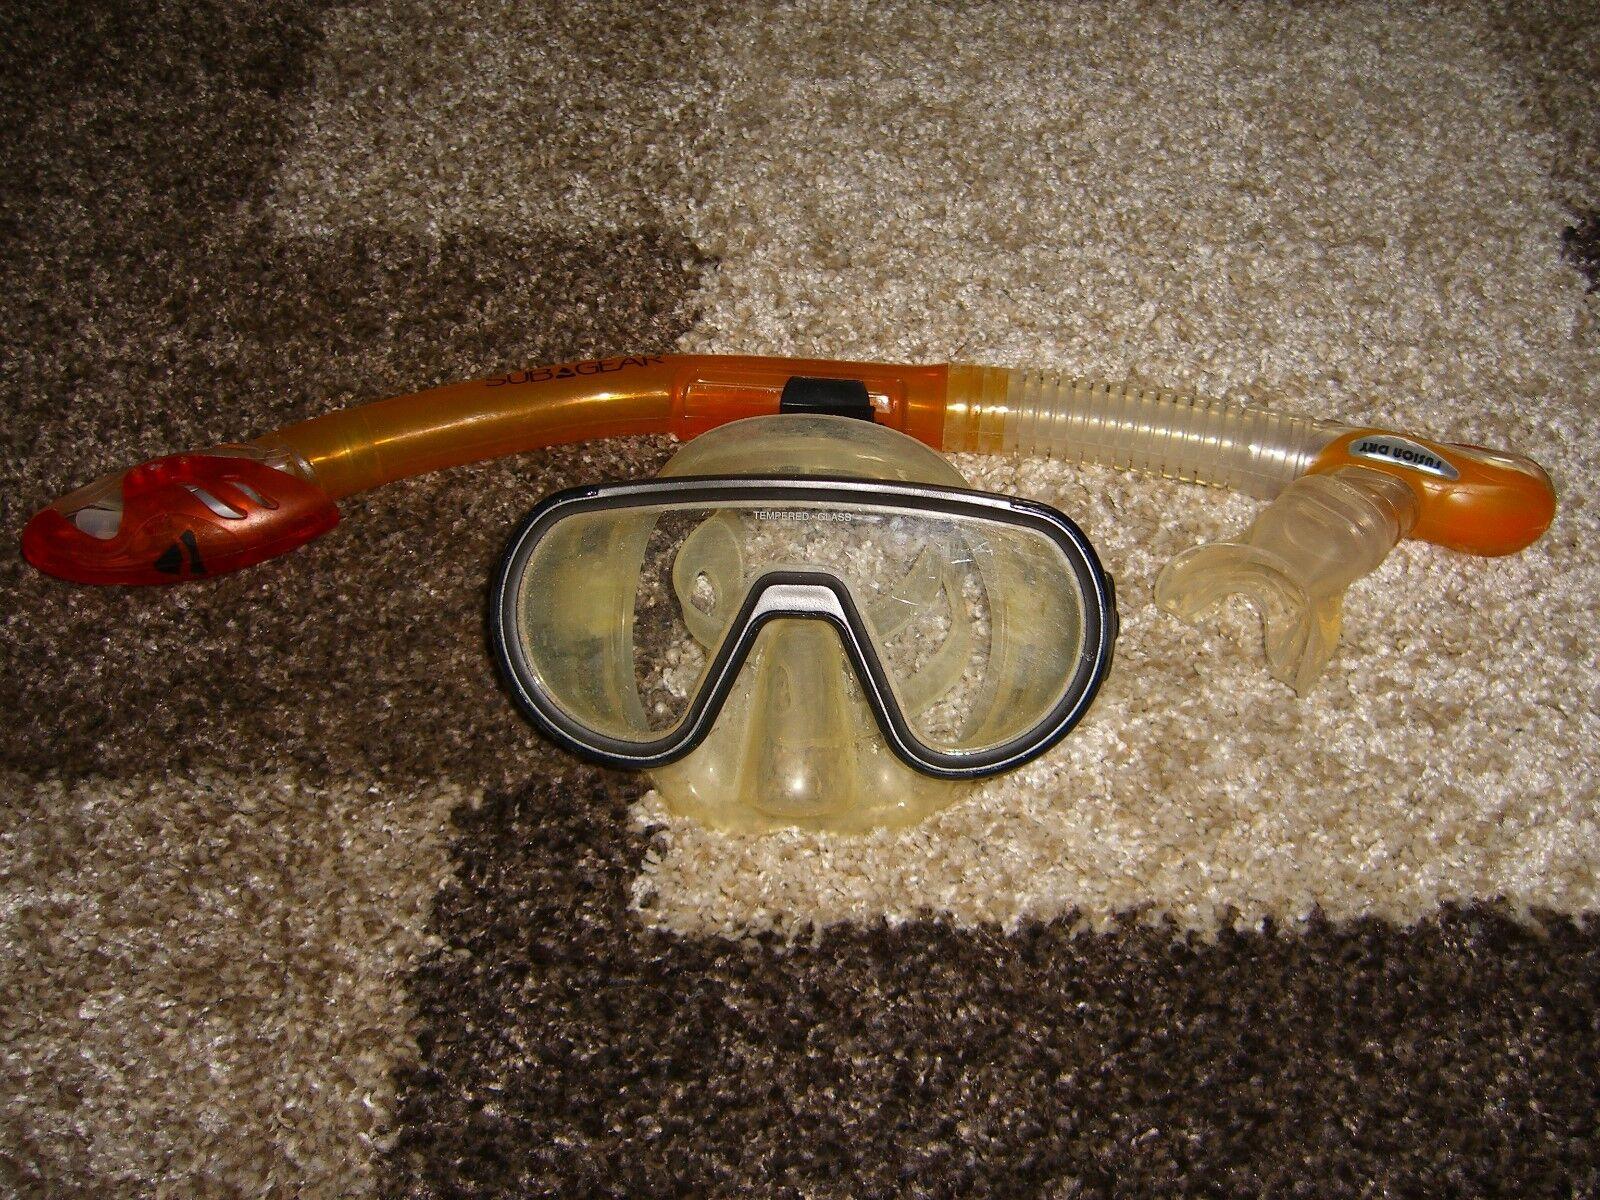 SUB SUB SUB Gear Schnorchel Fusion Dry und Taucherbrille 0bce1f